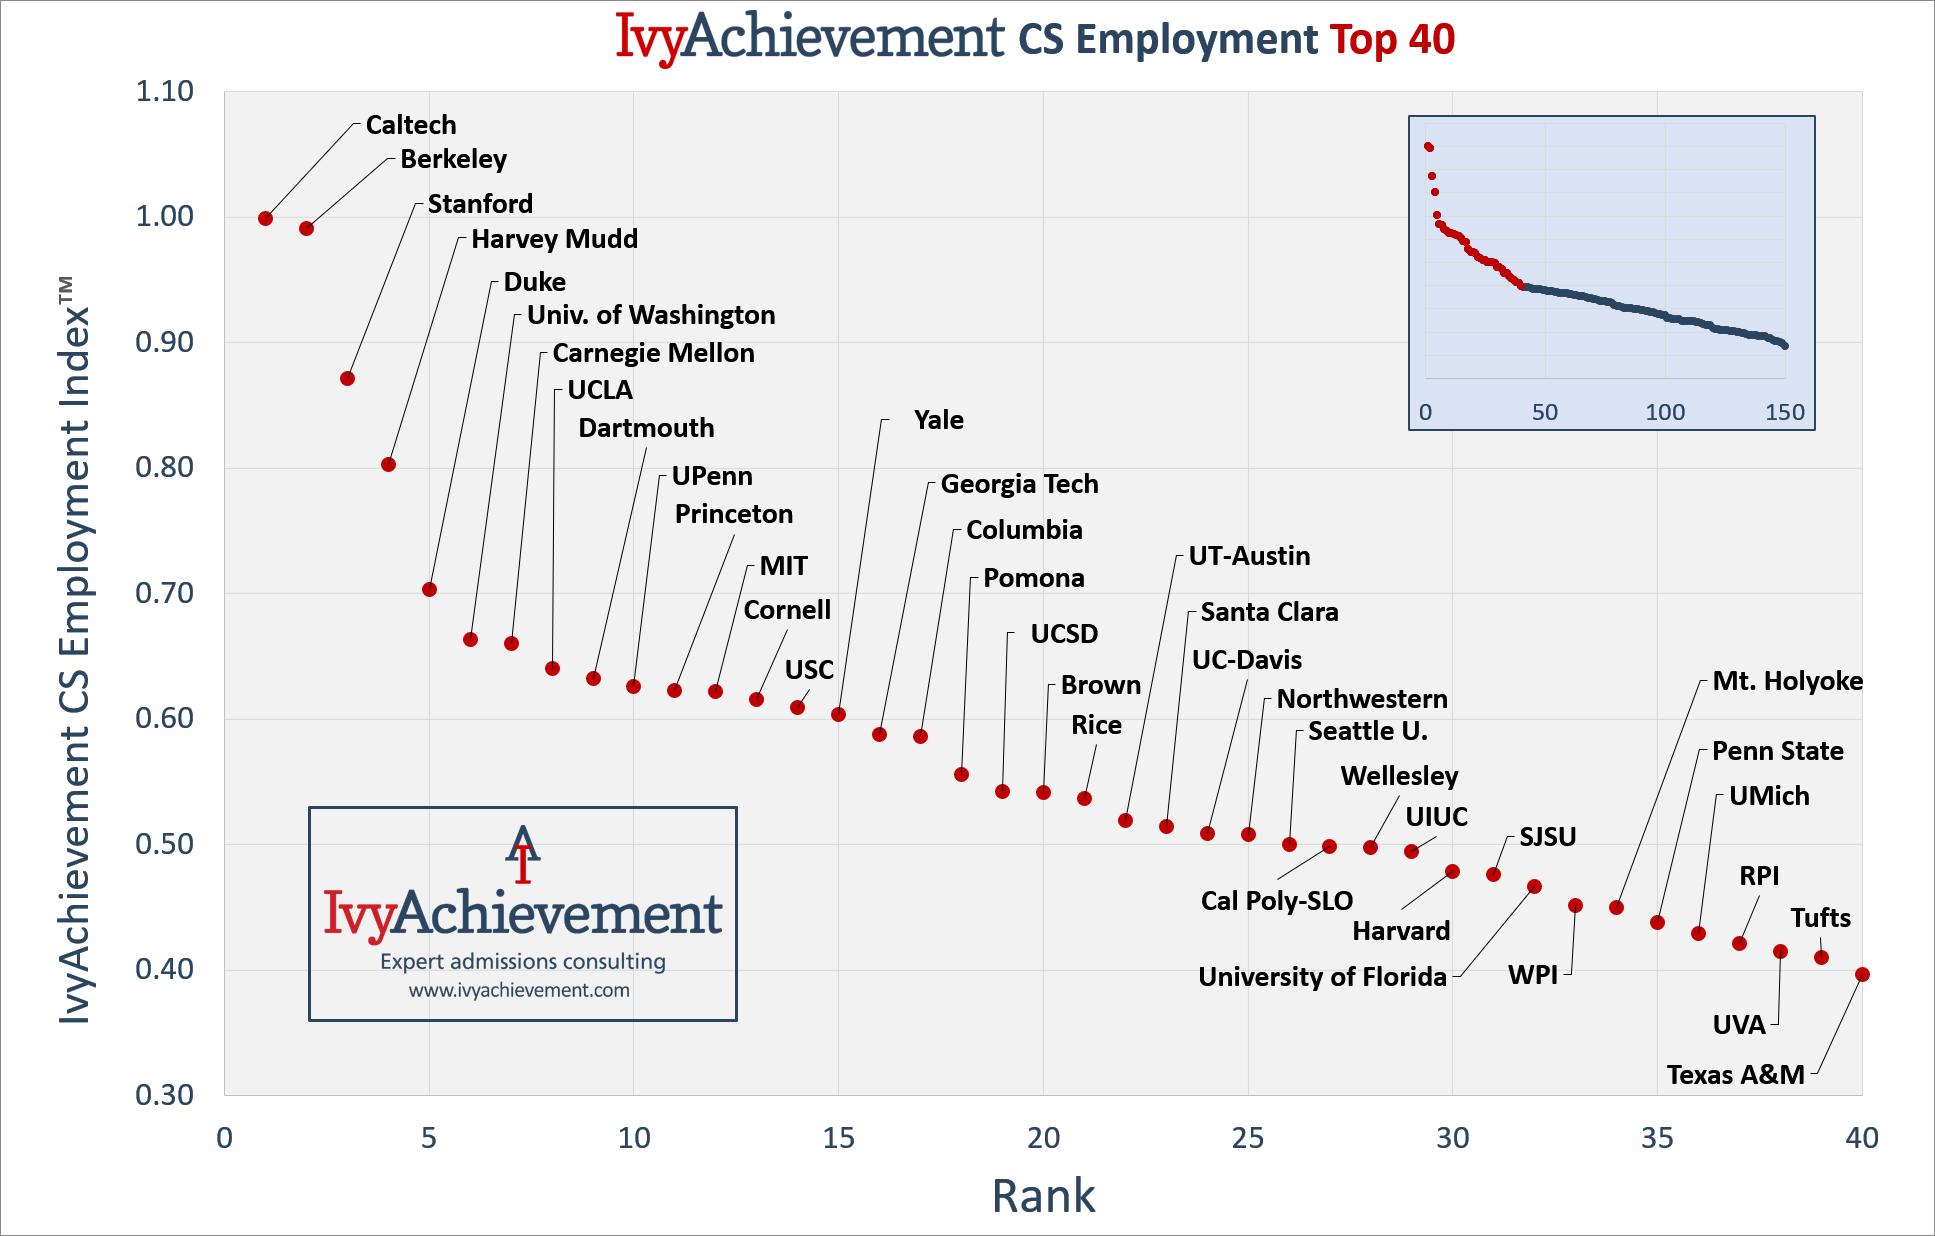 IvyAchievement CS Employment - top 40 graph